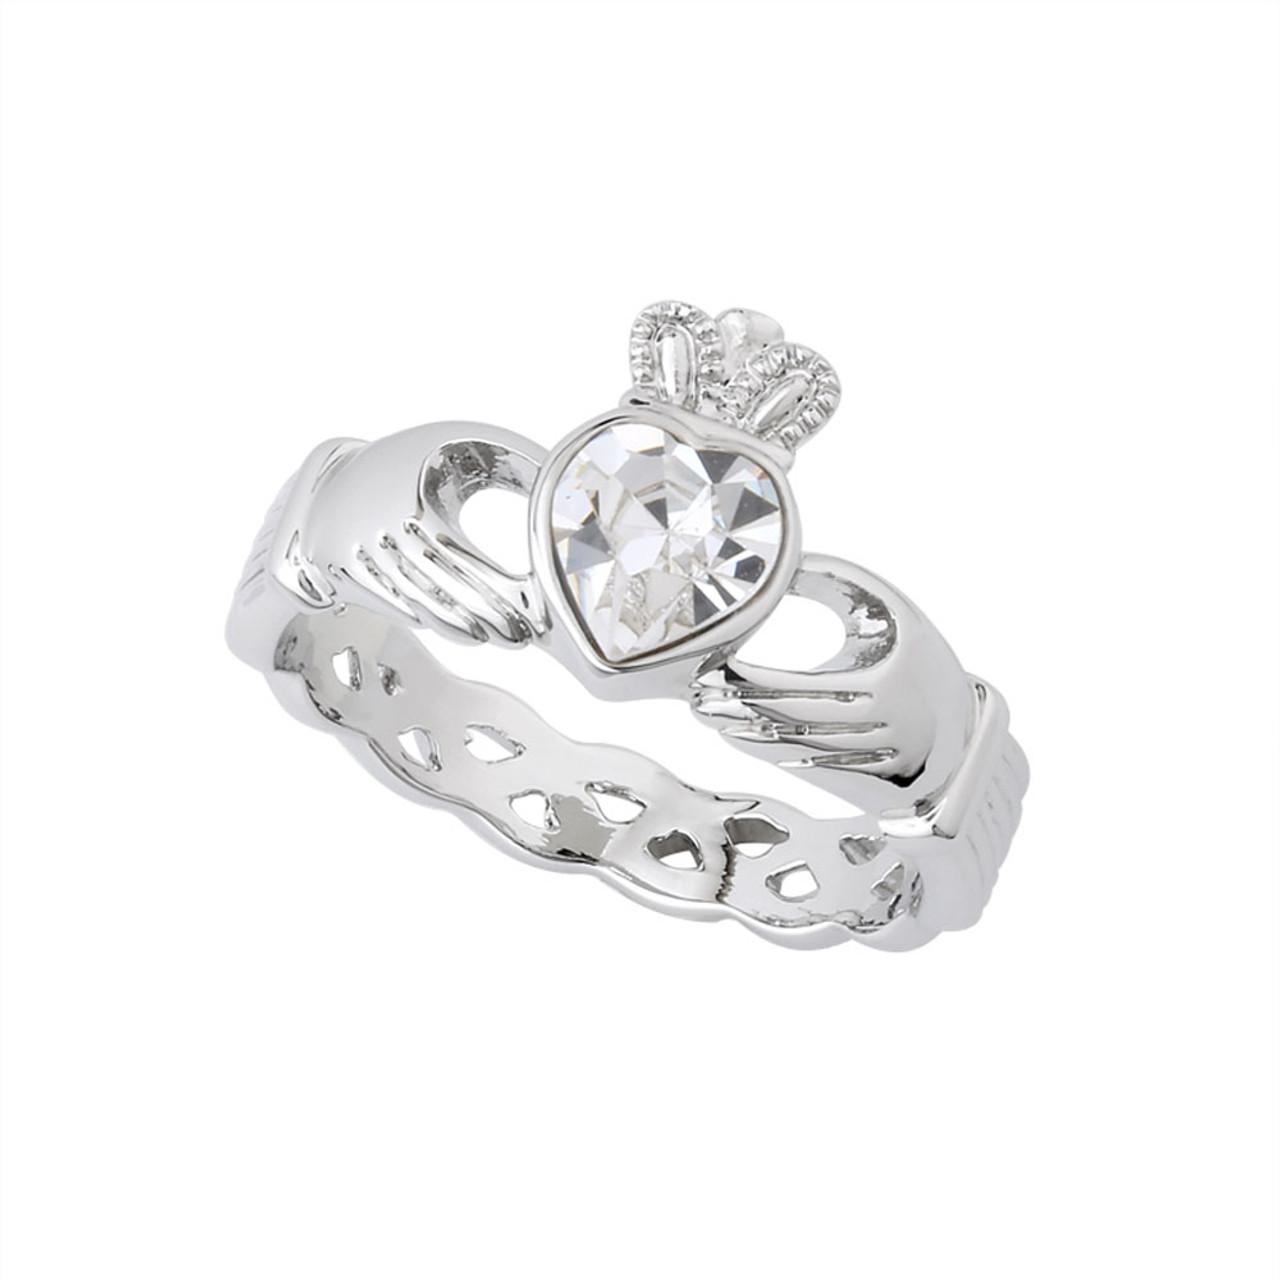 Claddagh Ring in Rhodium with Clear Crystal